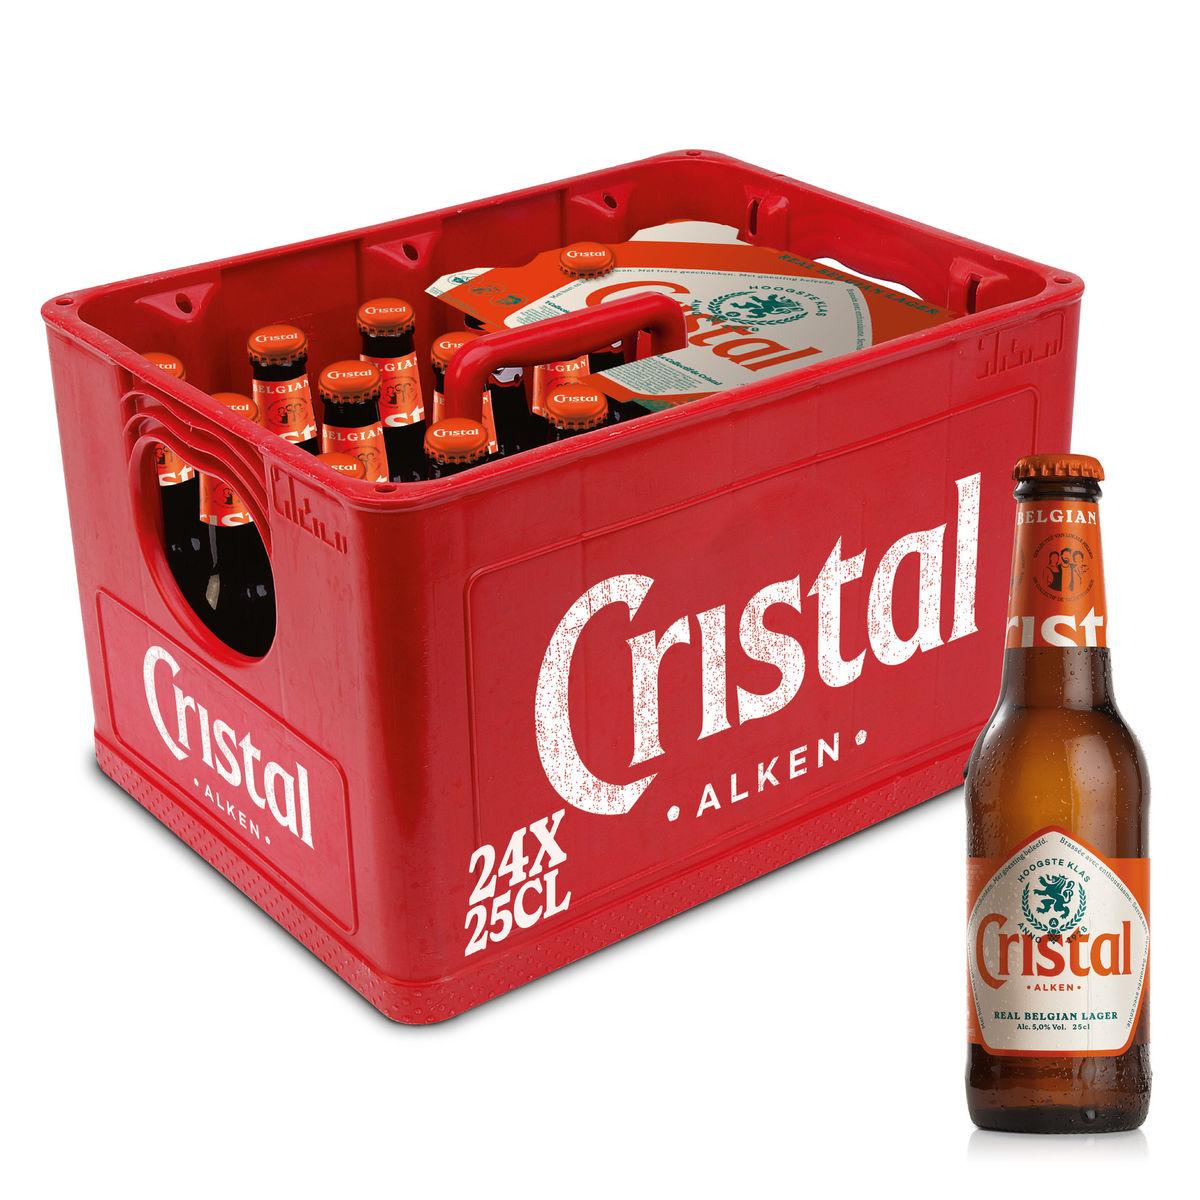 Cristal Alken Real Belgian Lager 24 x 25 cl